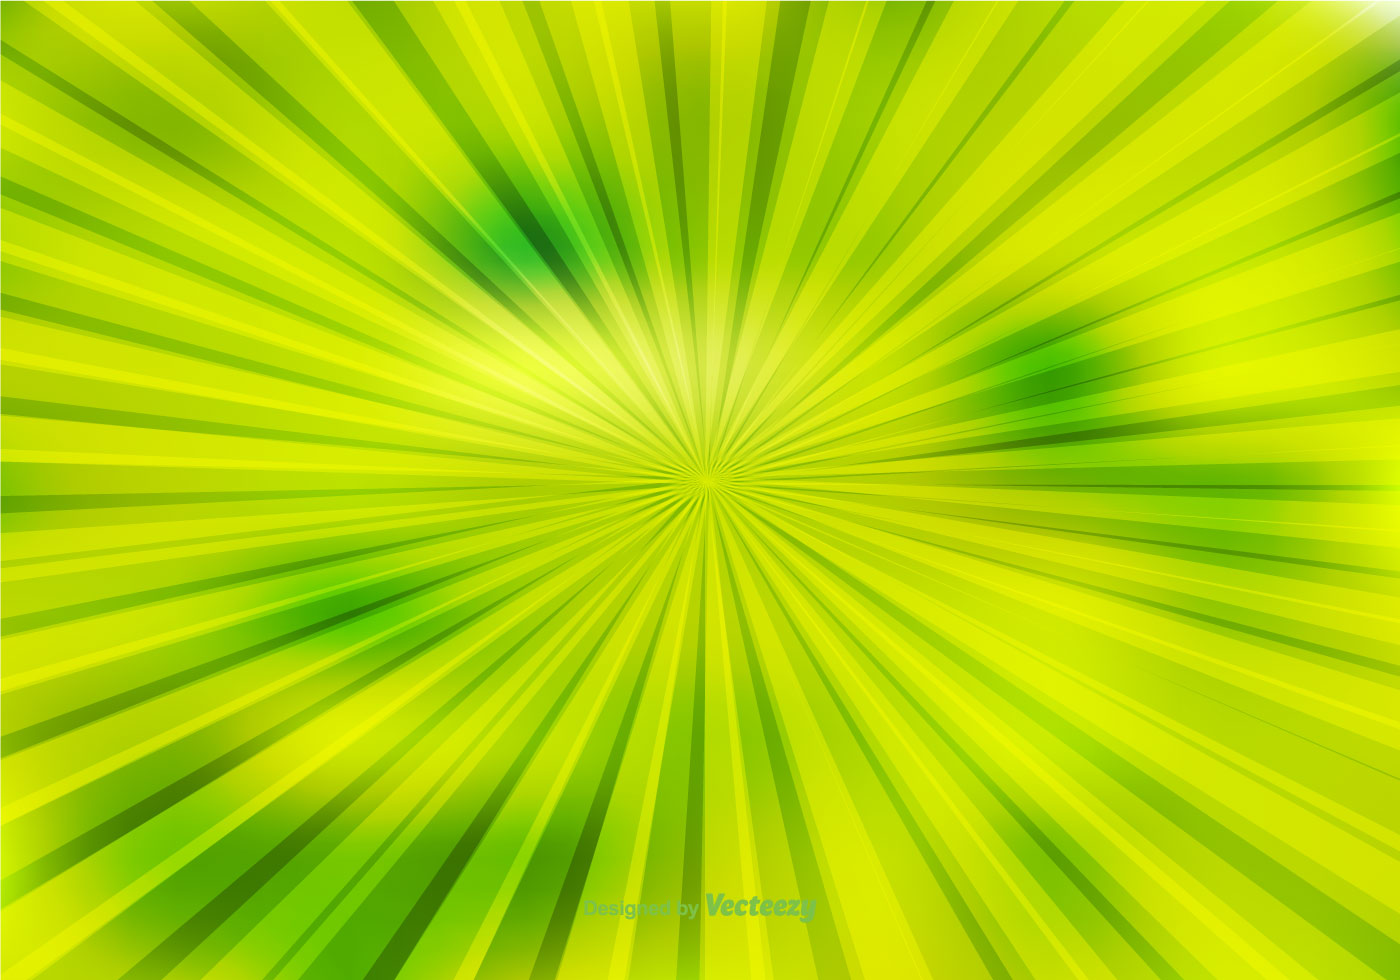 green sunburst background - photo #6